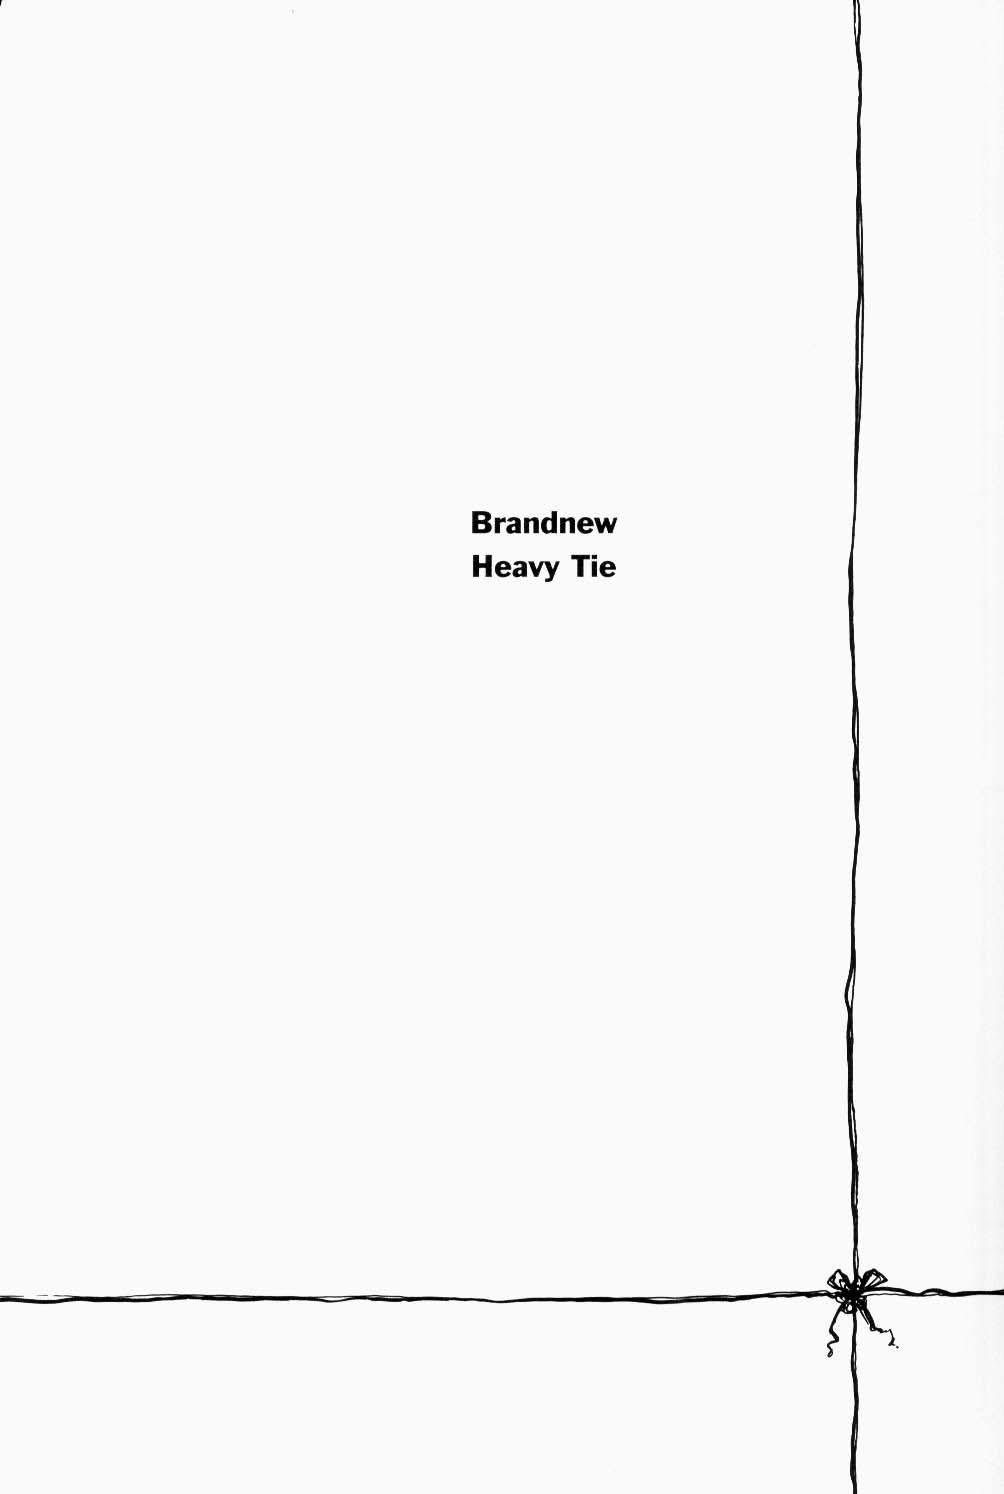 Brandnew Heavy Tie 2